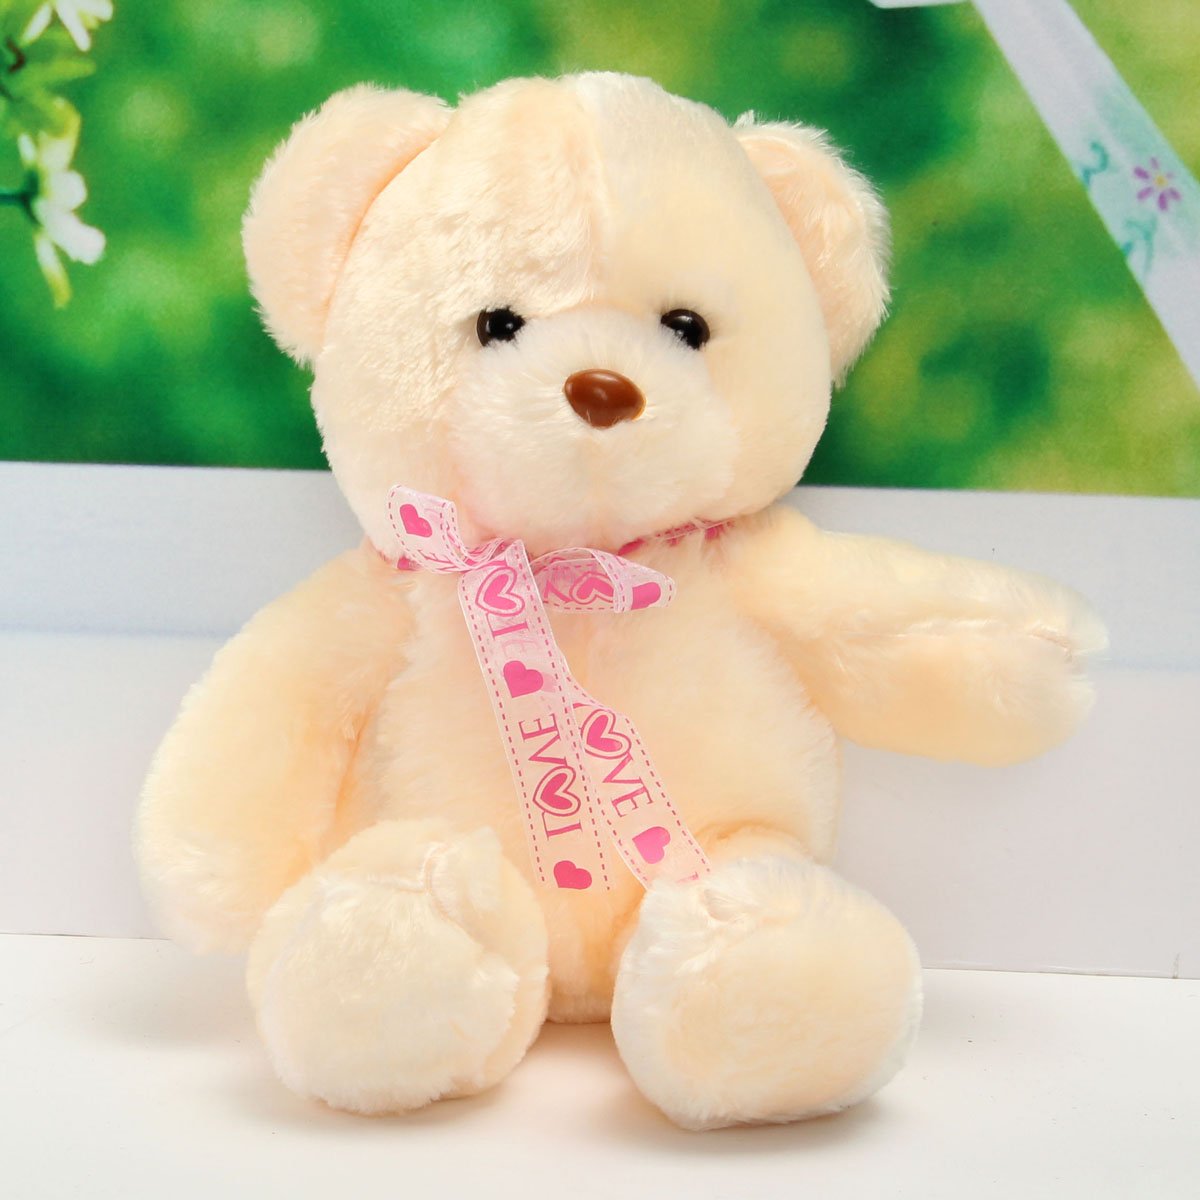 50CM LED Flash Light Colorful Luminous Teddy Bear Plush Doll Children Toy